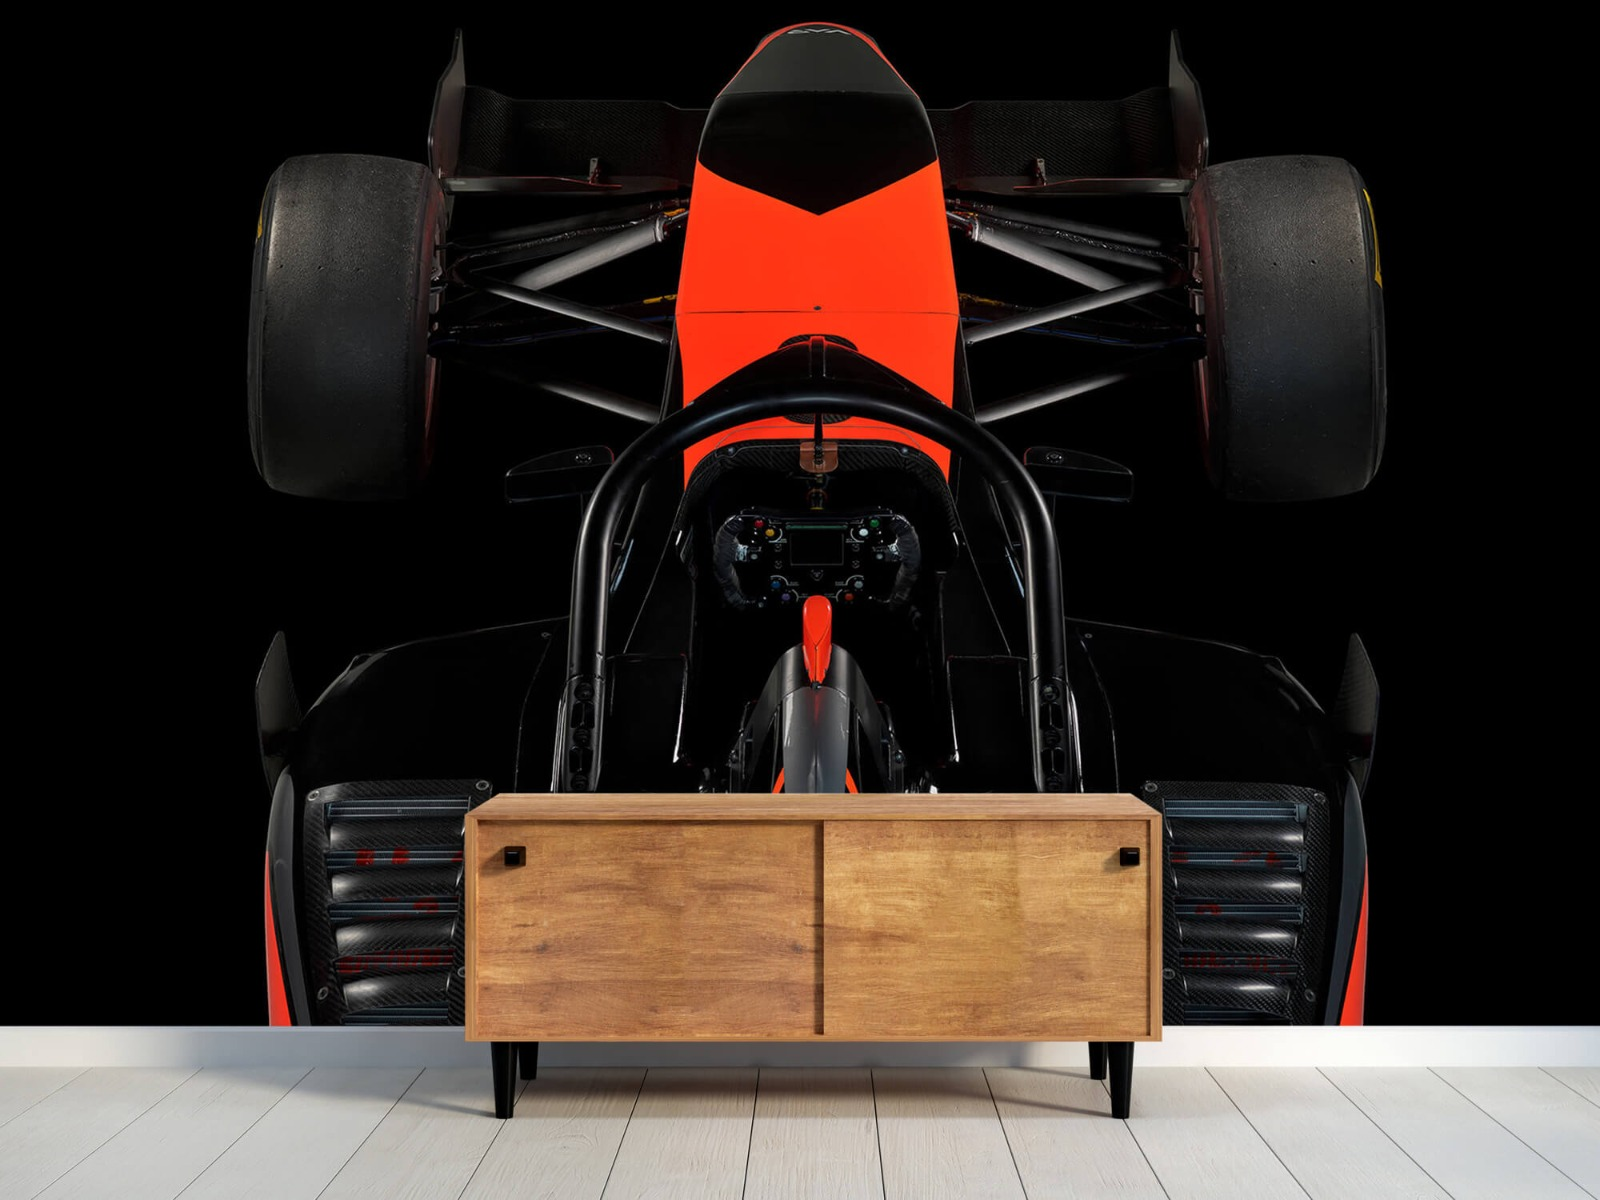 Sportauto's - Formule 3 - Cockpit view - dark - Tienerkamer 9